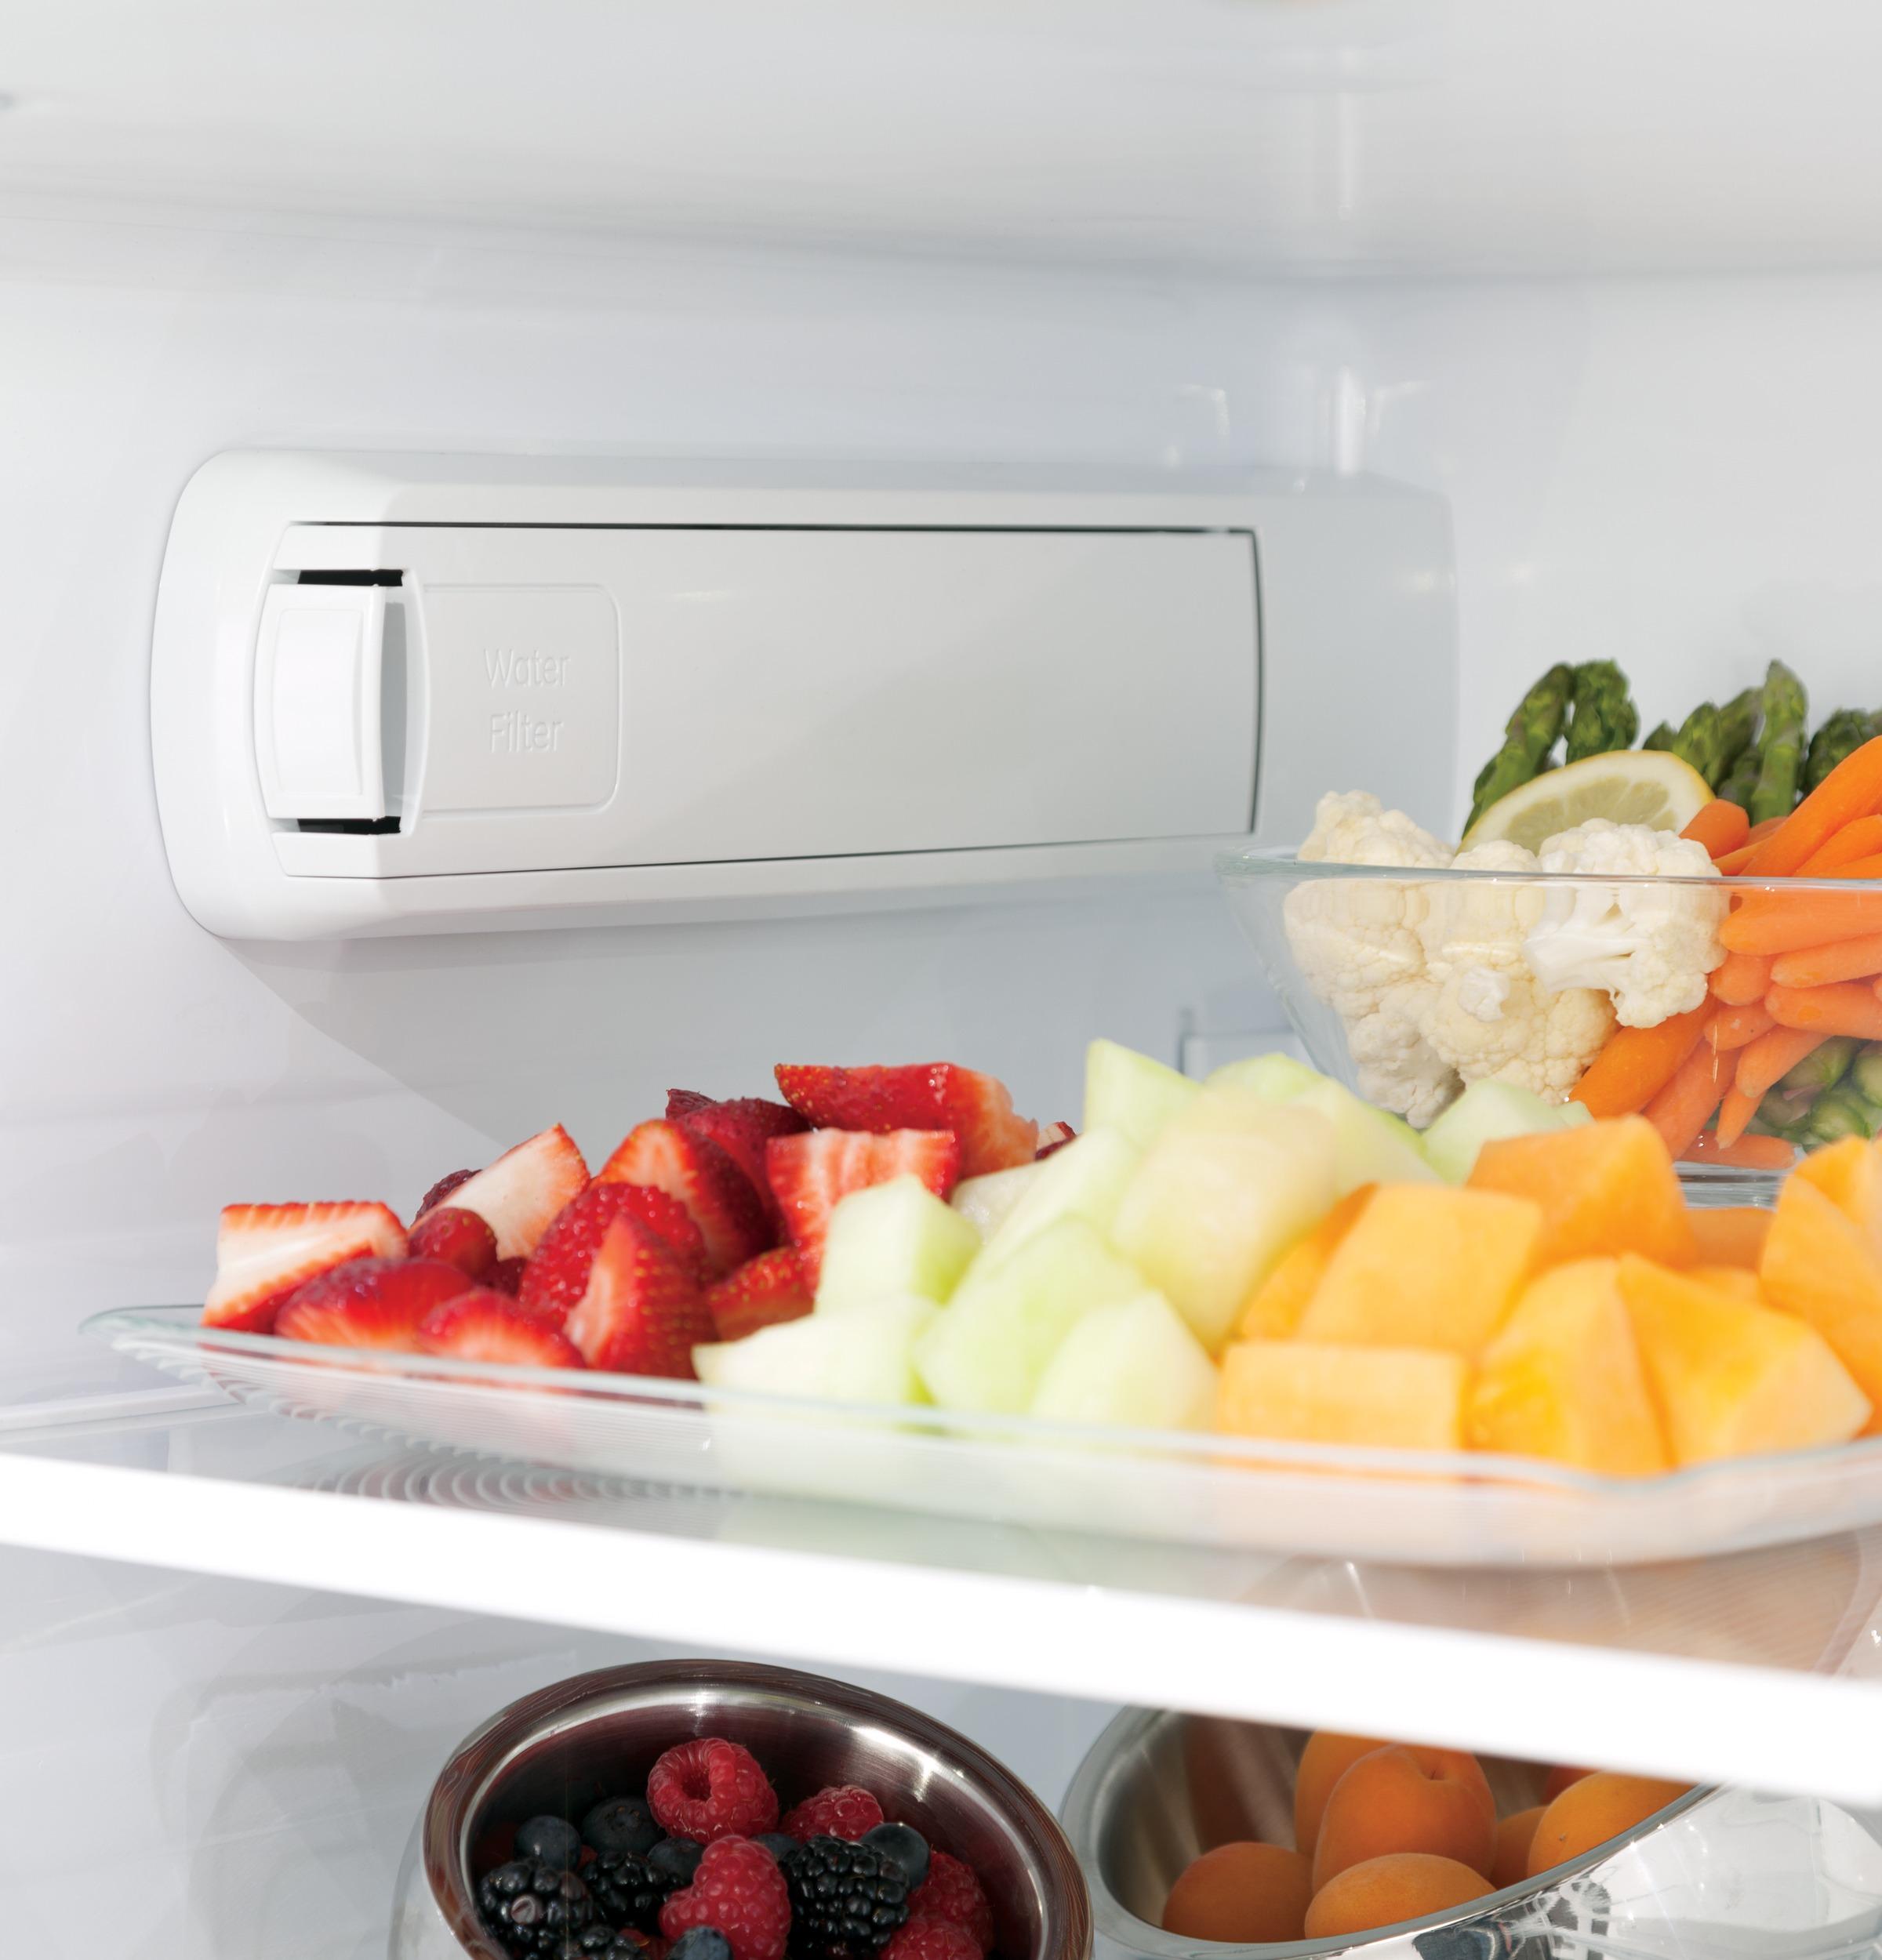 GE Appliances GFE28GMKES 27.8 cu. ft. French Door Refrigerator - Slate